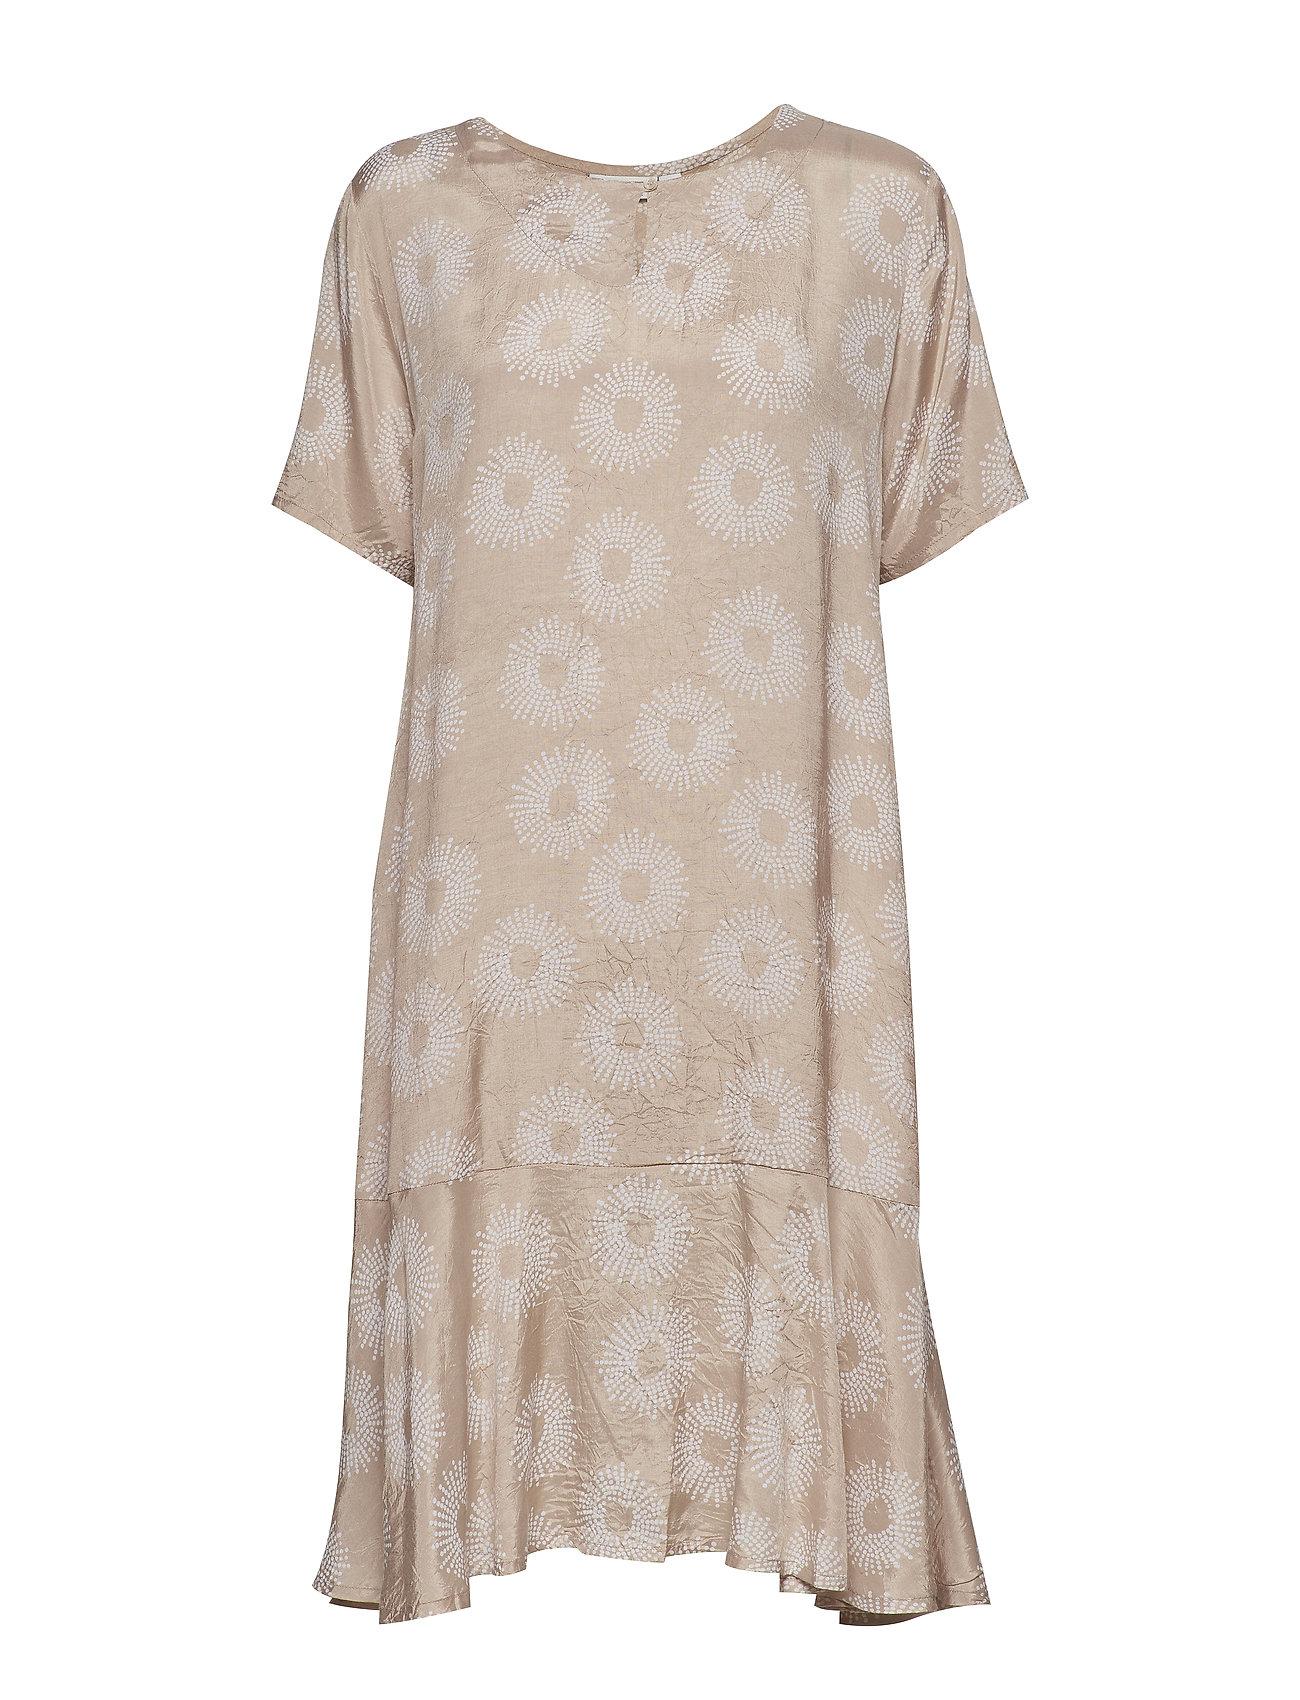 Masai Nebit dress - SAND ORG